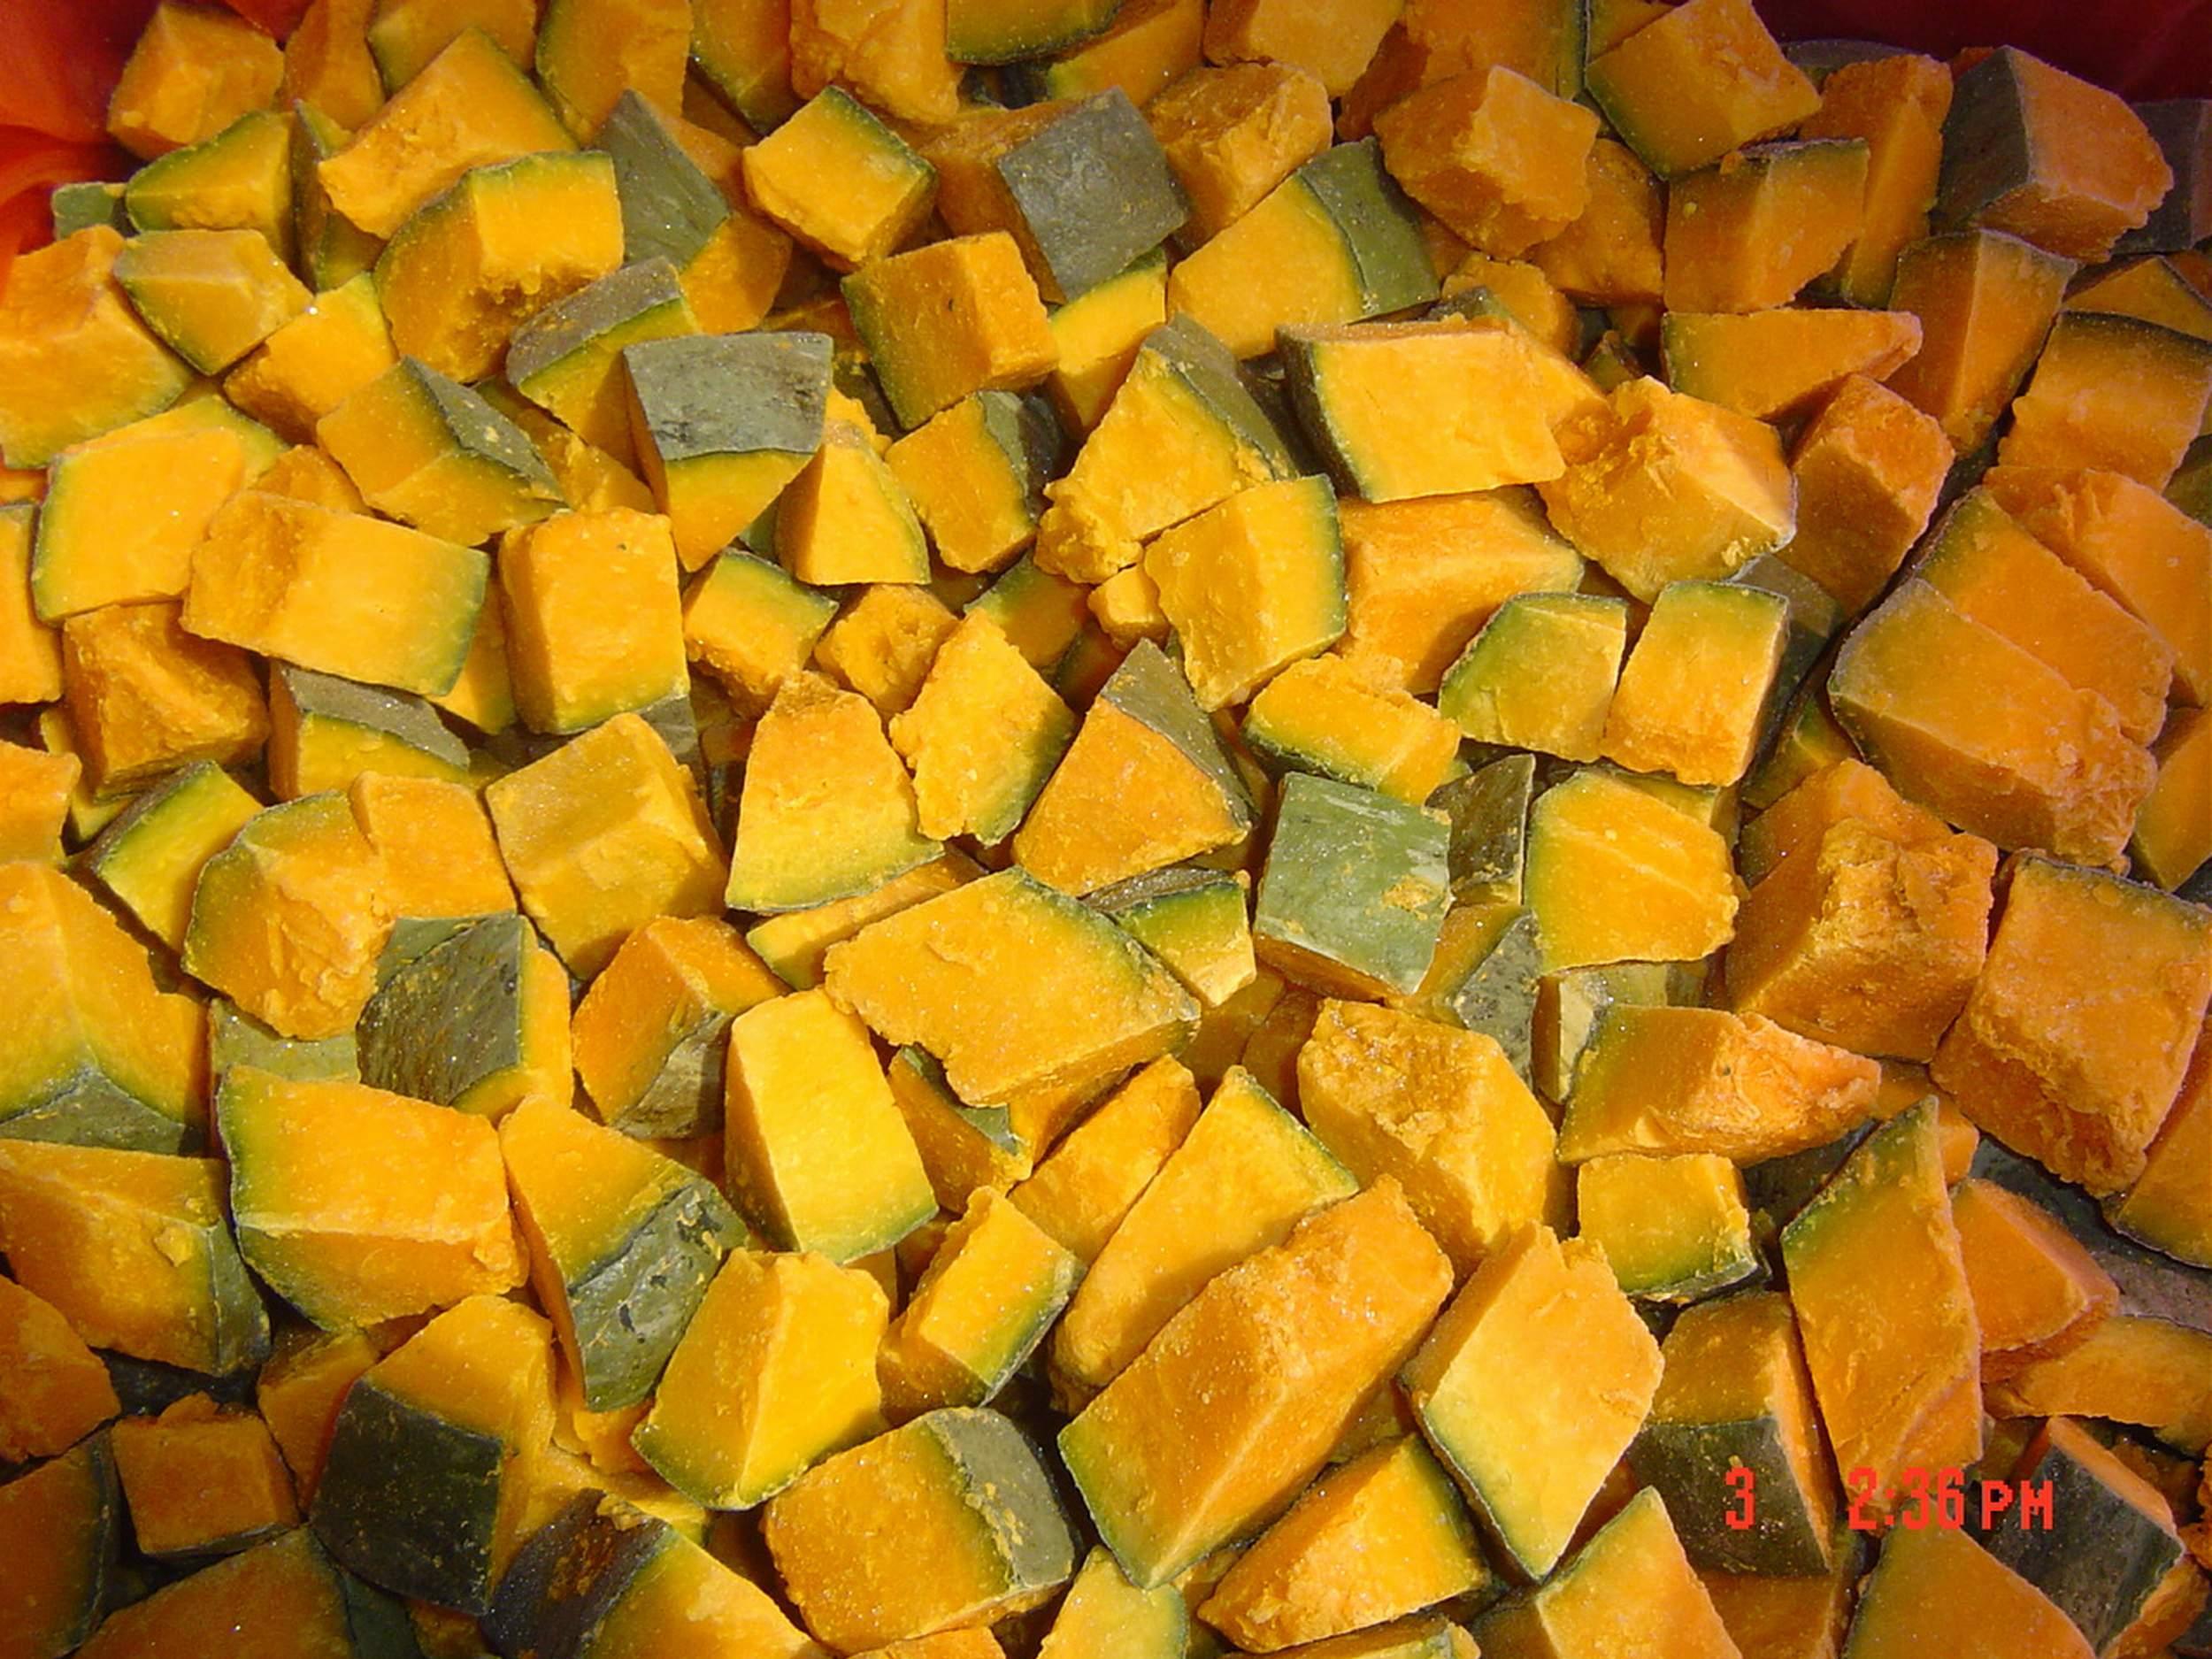 2018 Vietnamese high quality Frozen Diced Pumpkin IQF in 2020